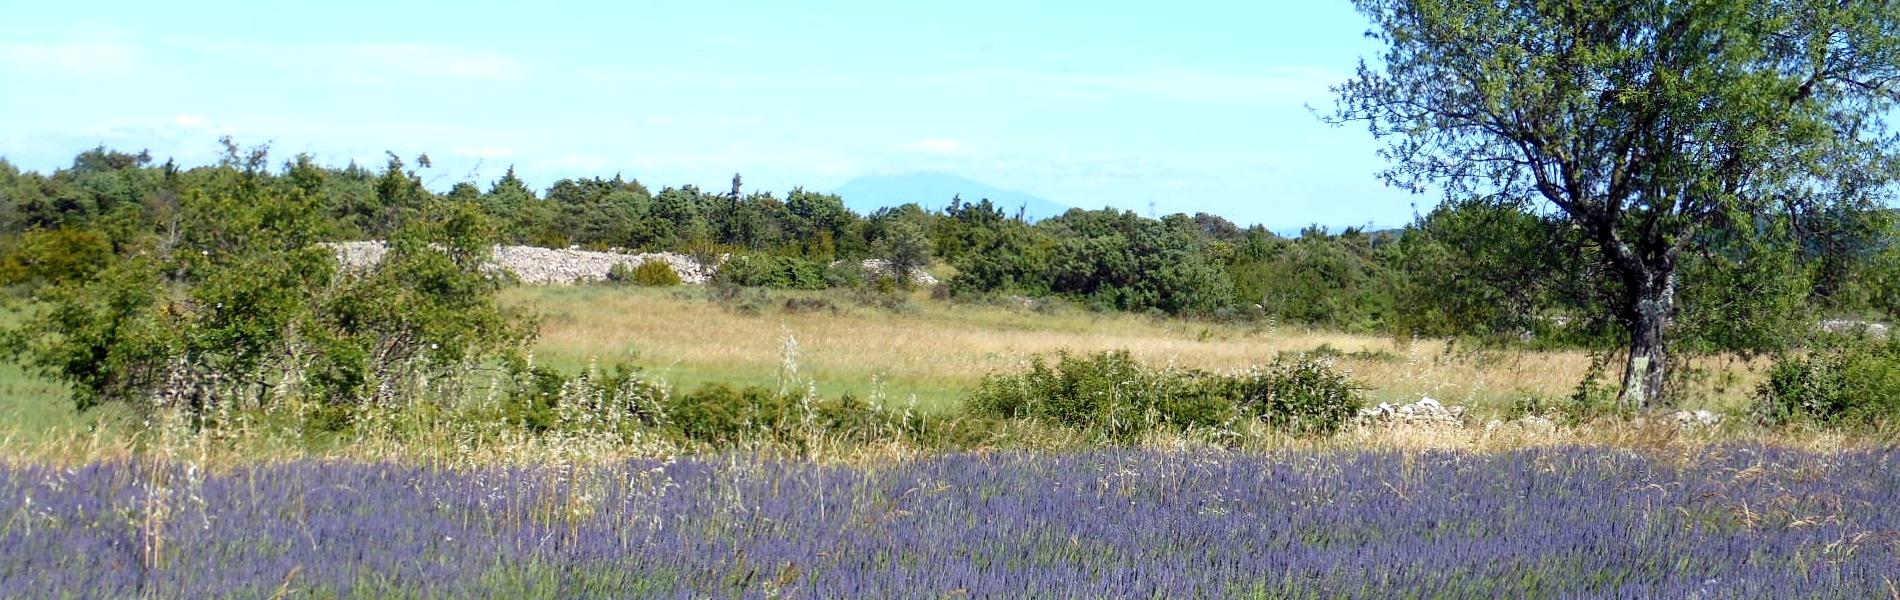 En Ardèche, un havre de paix